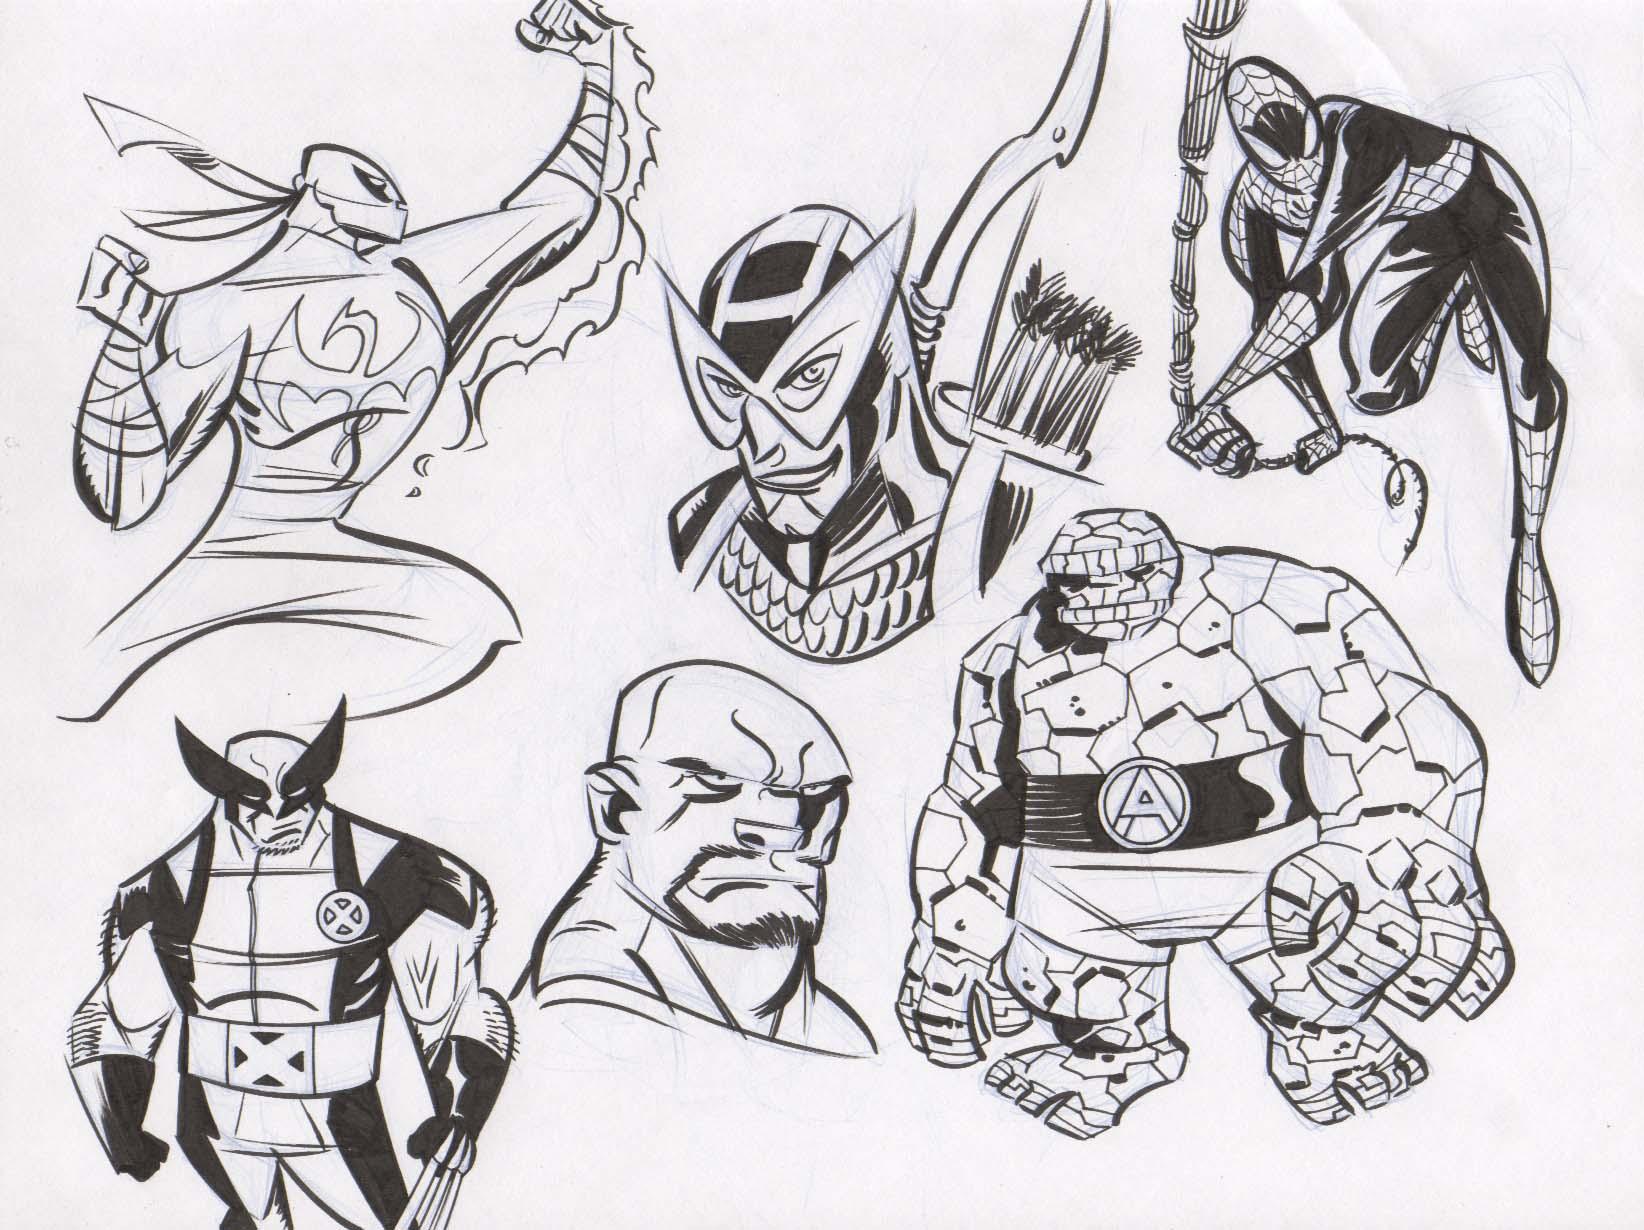 Avengers Warmups 1 by dfridolfs